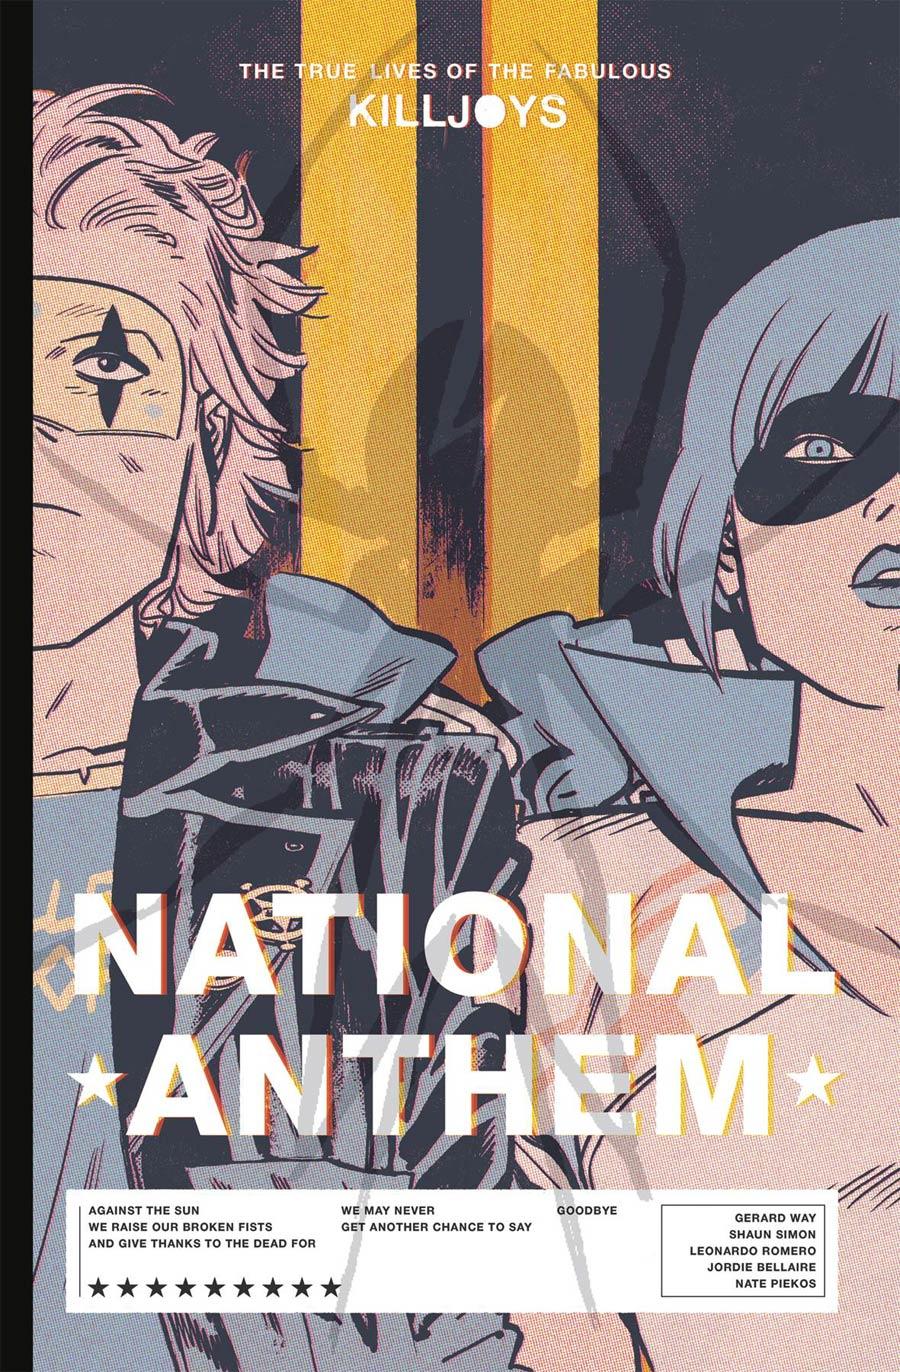 True Lives Of The Fabulous Killjoys National Anthem Library Edition HC